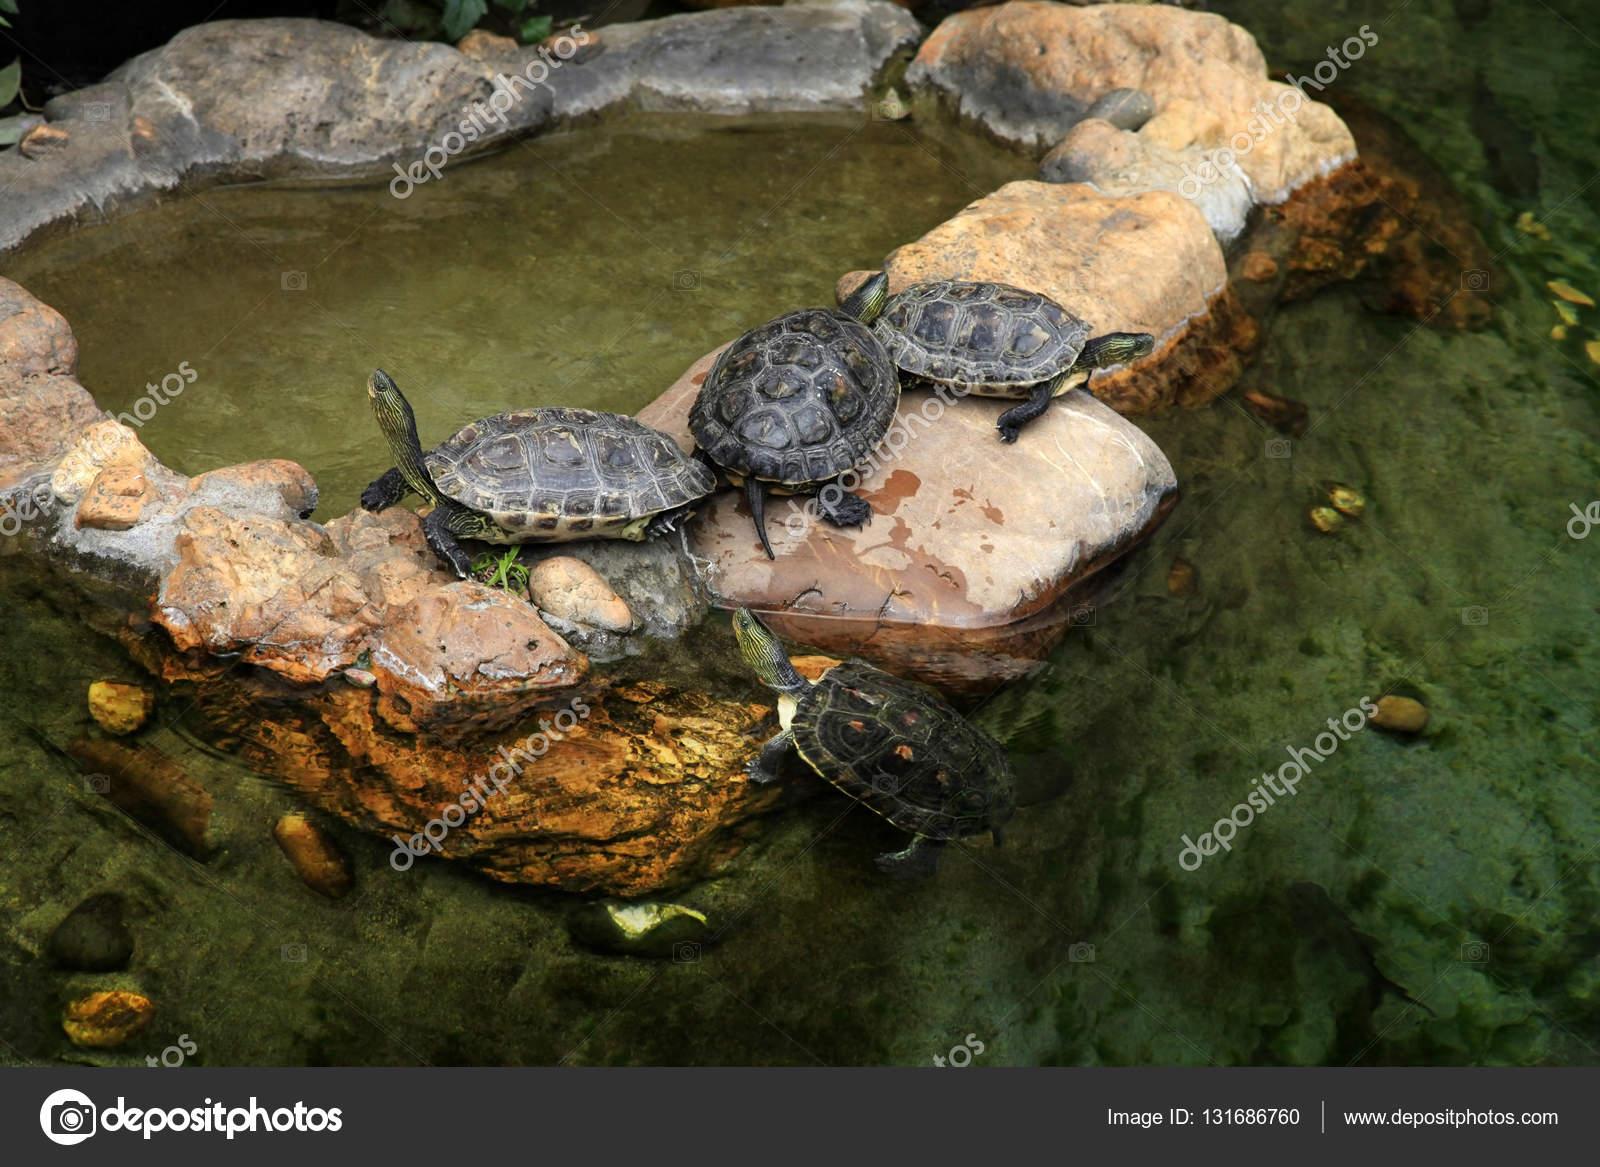 Tortugas de orejas rojas en el estanque foto de stock - Estanques para tortugas de agua ...